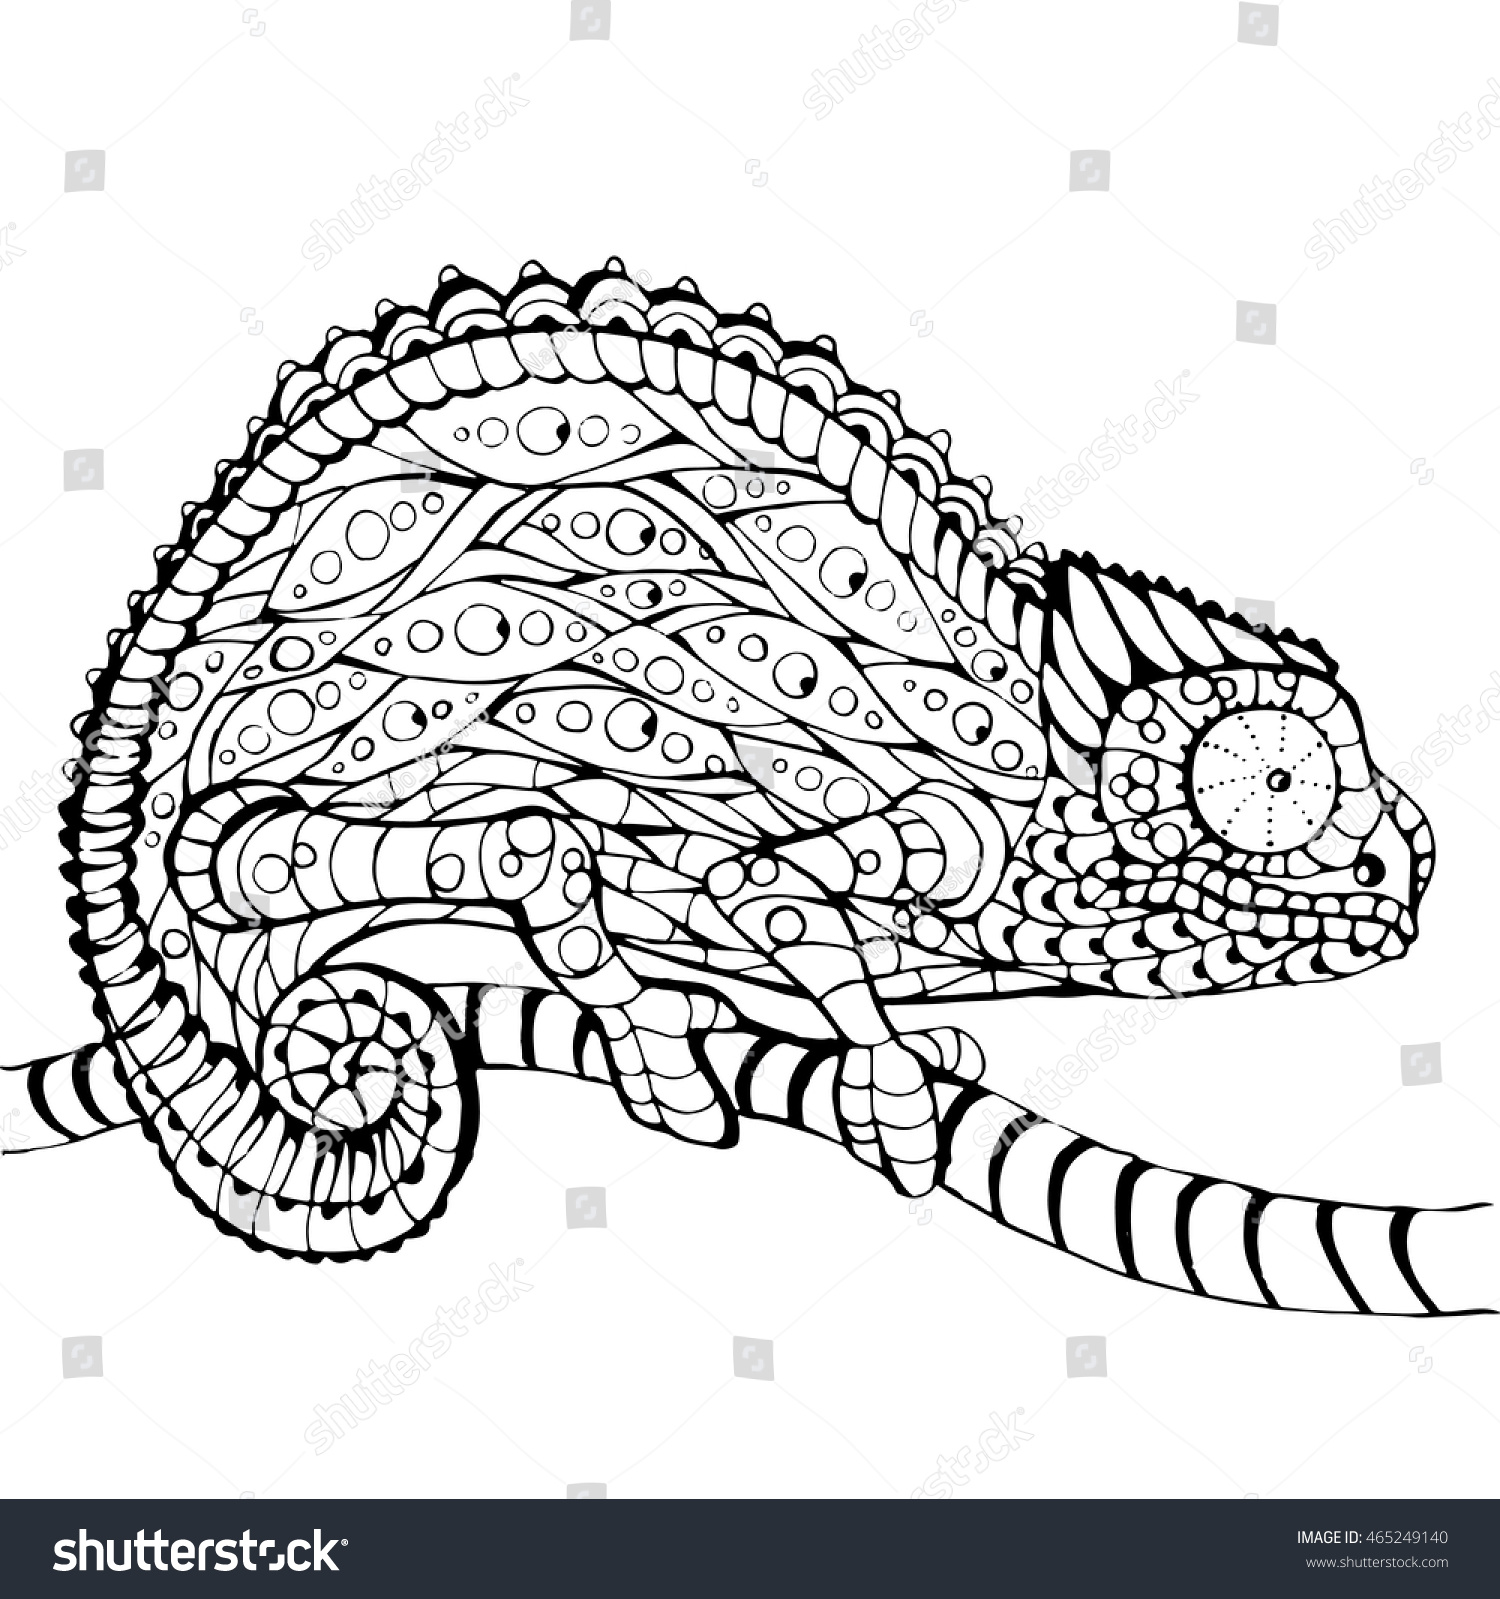 Chameleon Outline Tattoo: Chameleon Coloring Book Page Line Art Stock Vector